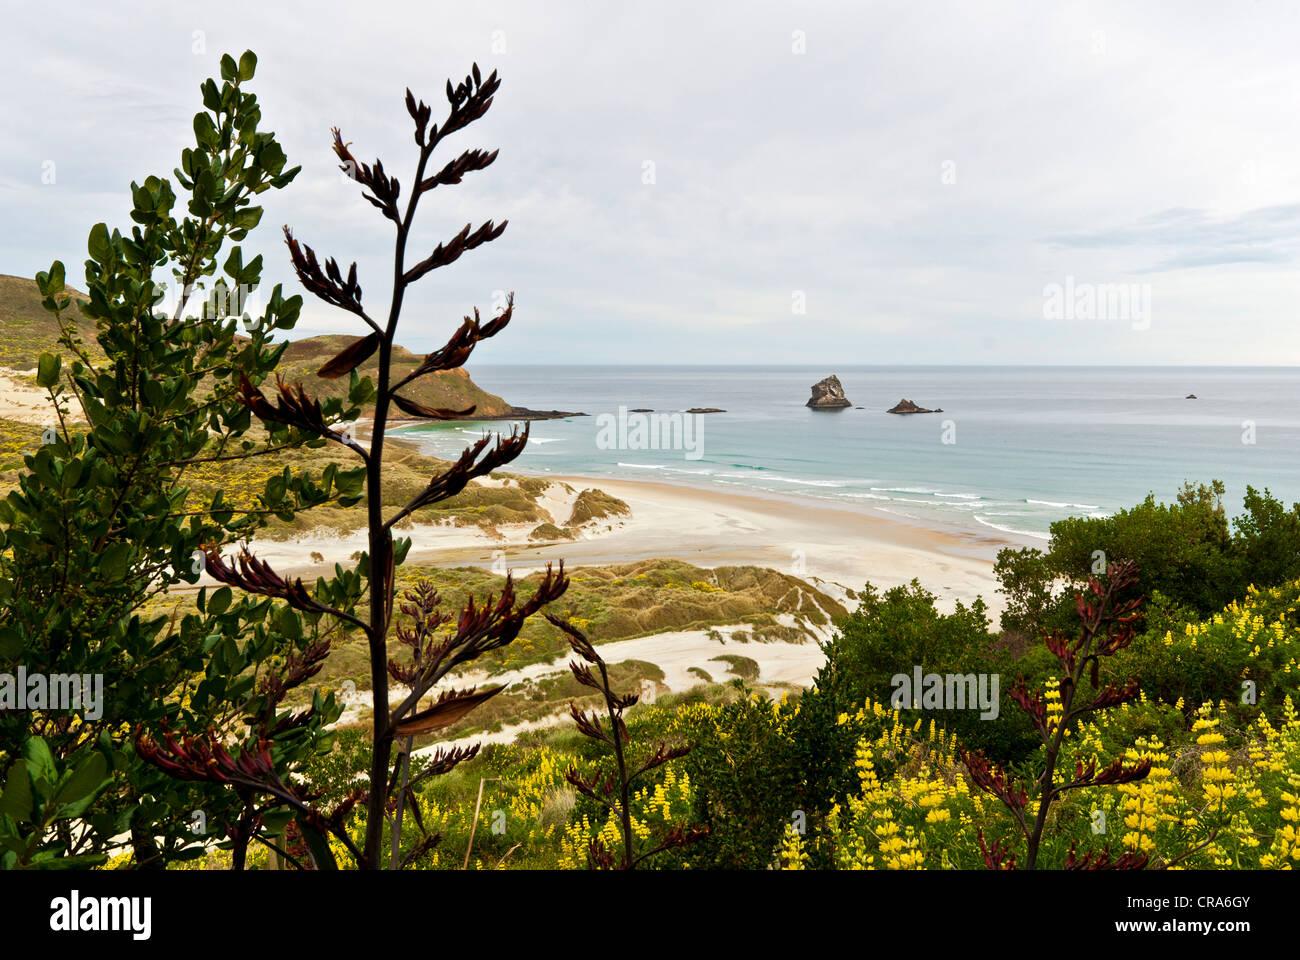 New Zealand Otago Peninsula South Island coastal vegetation beach sea and rocks - Stock Image